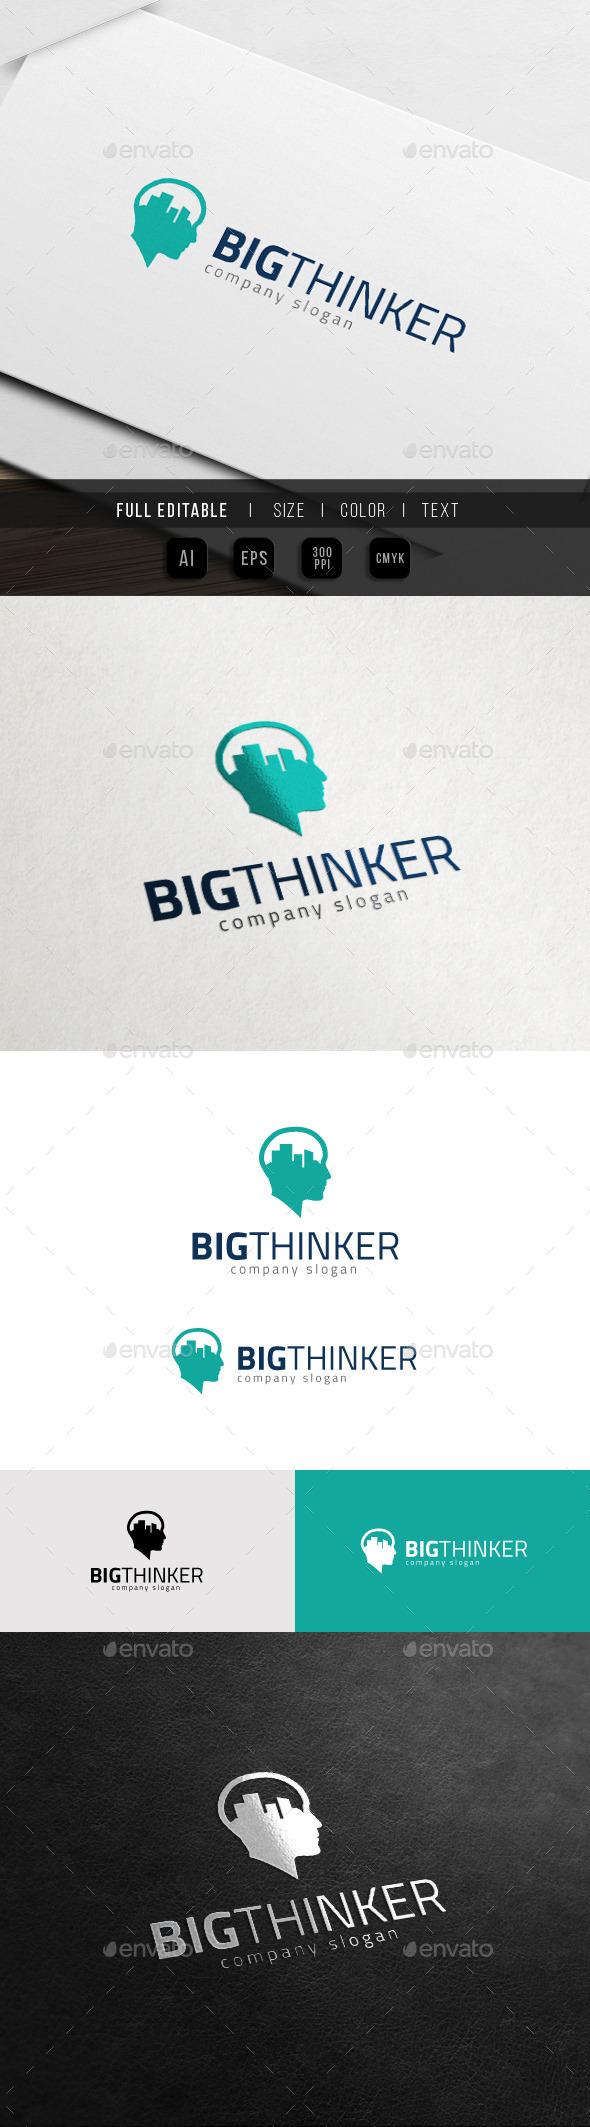 Big City Idea - Vision Thinker Logo